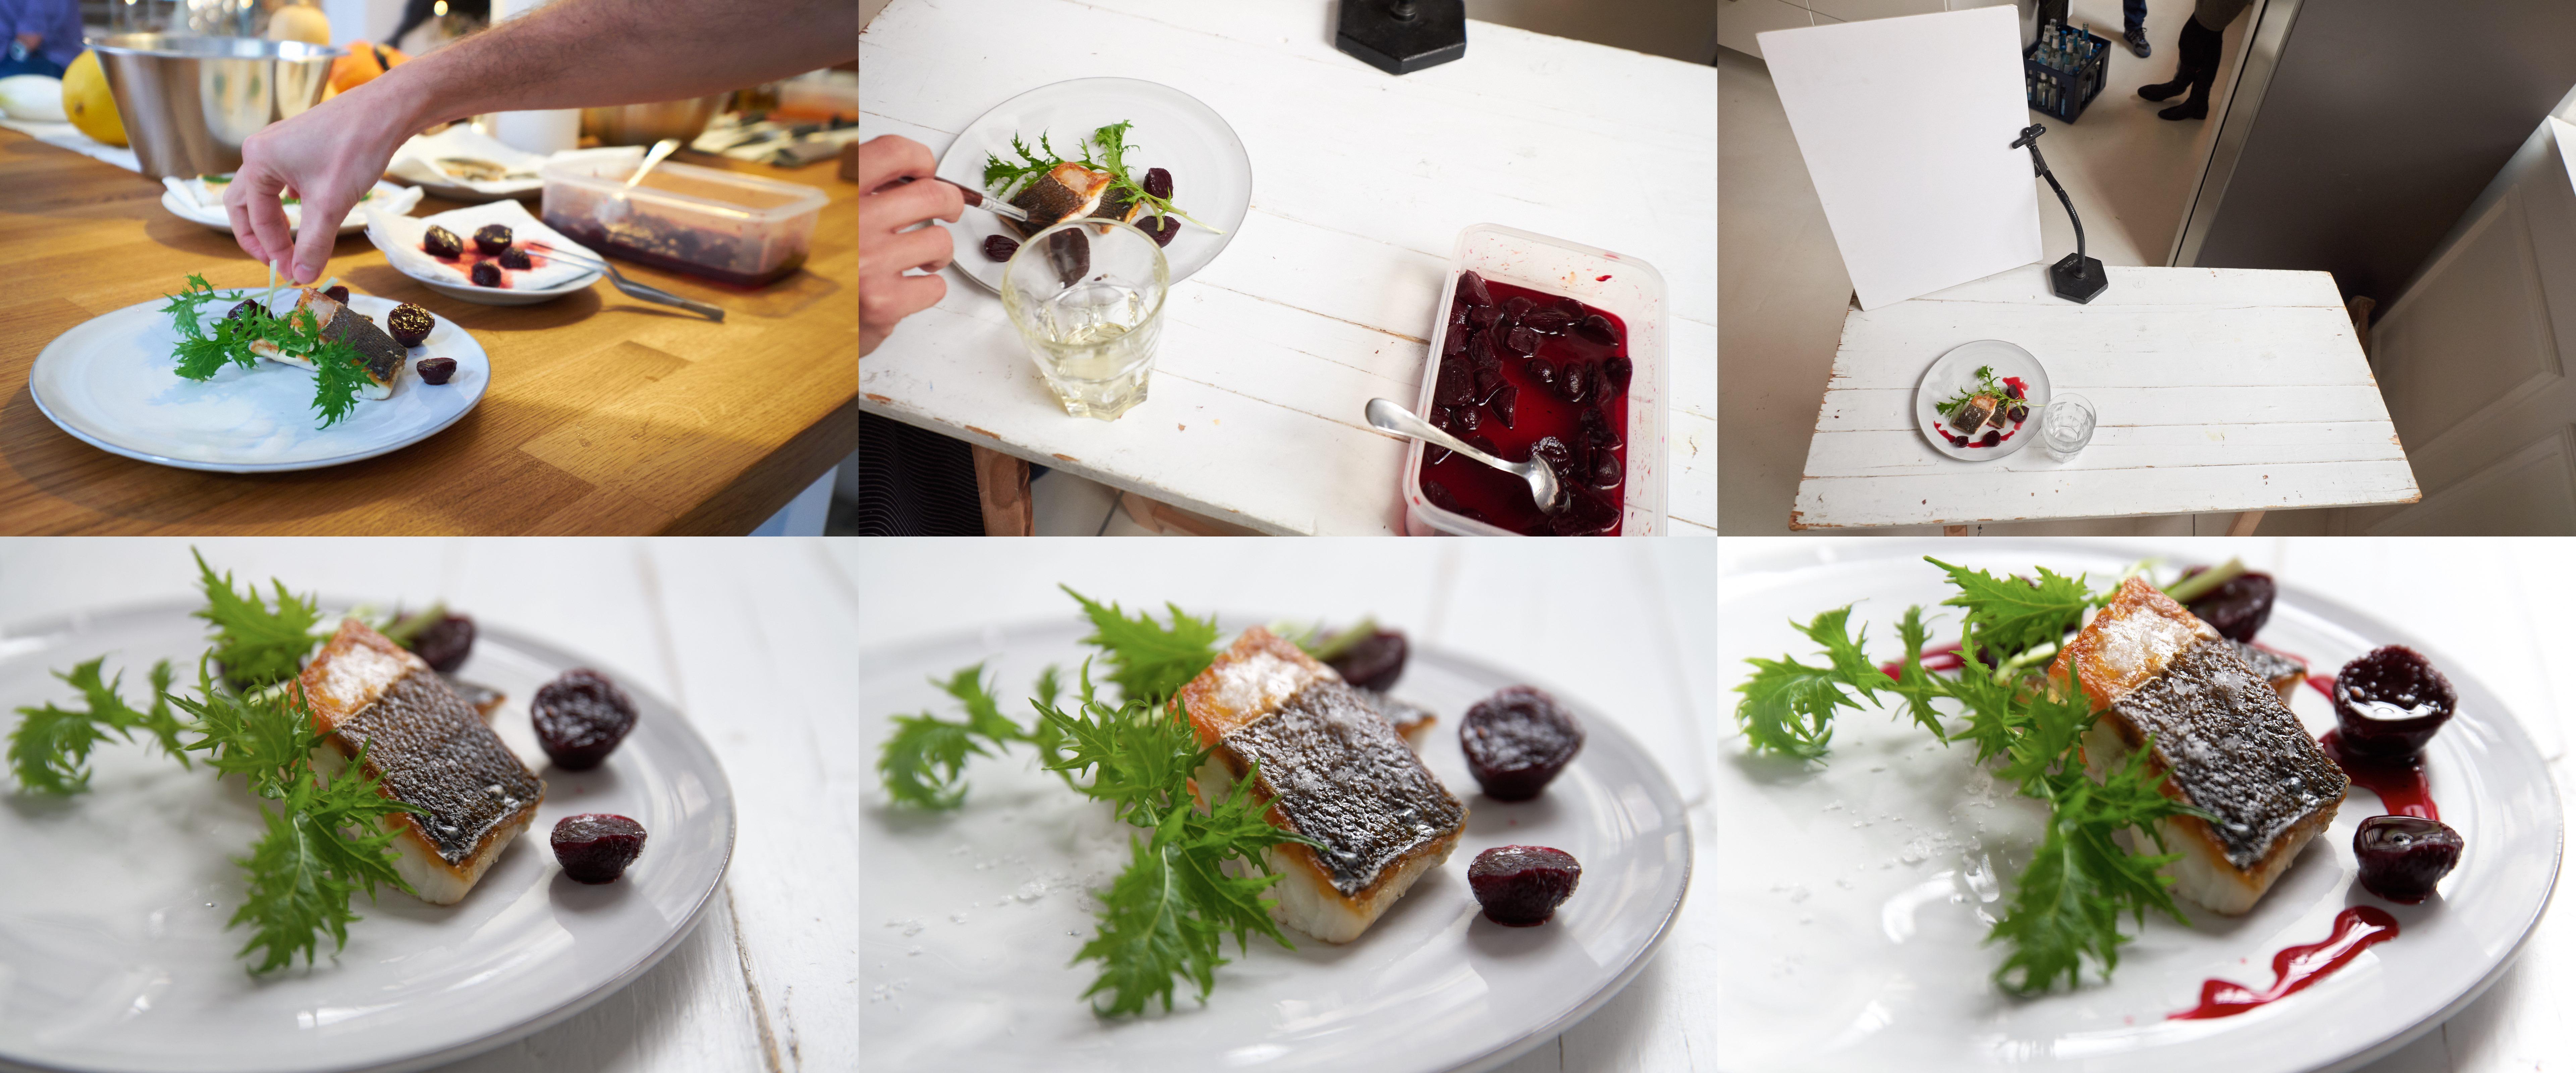 12 tipps und tricks zur food photography. Black Bedroom Furniture Sets. Home Design Ideas